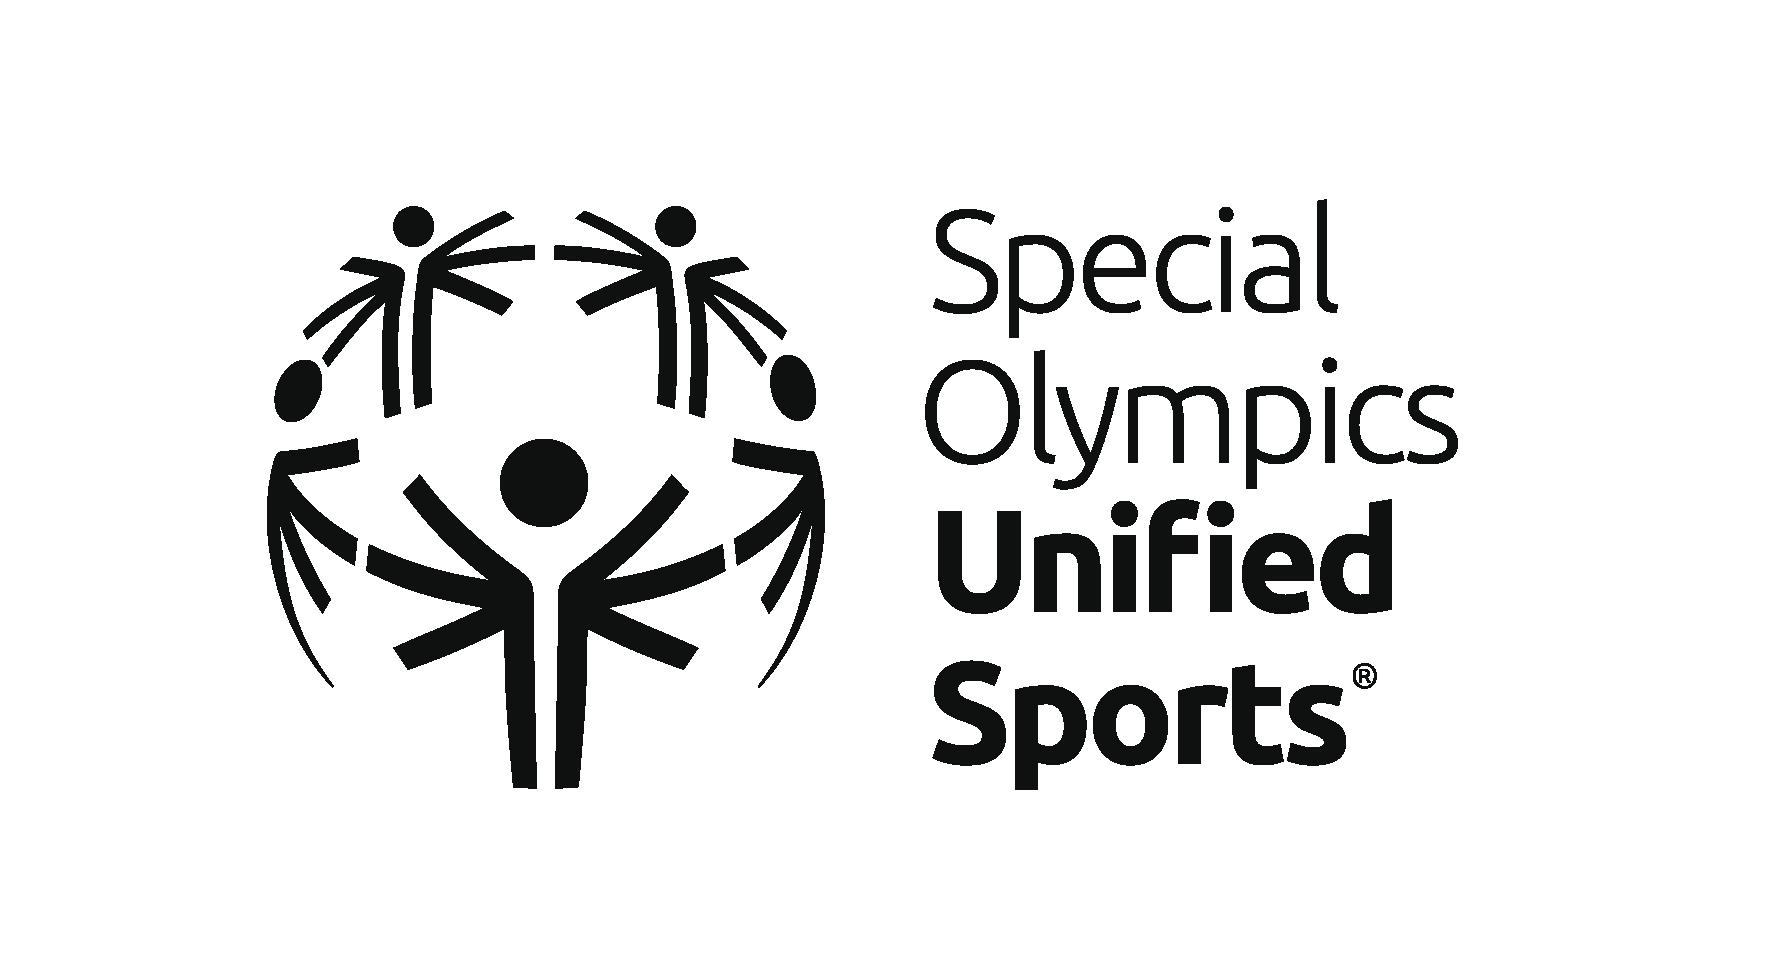 Special Olympics Brand